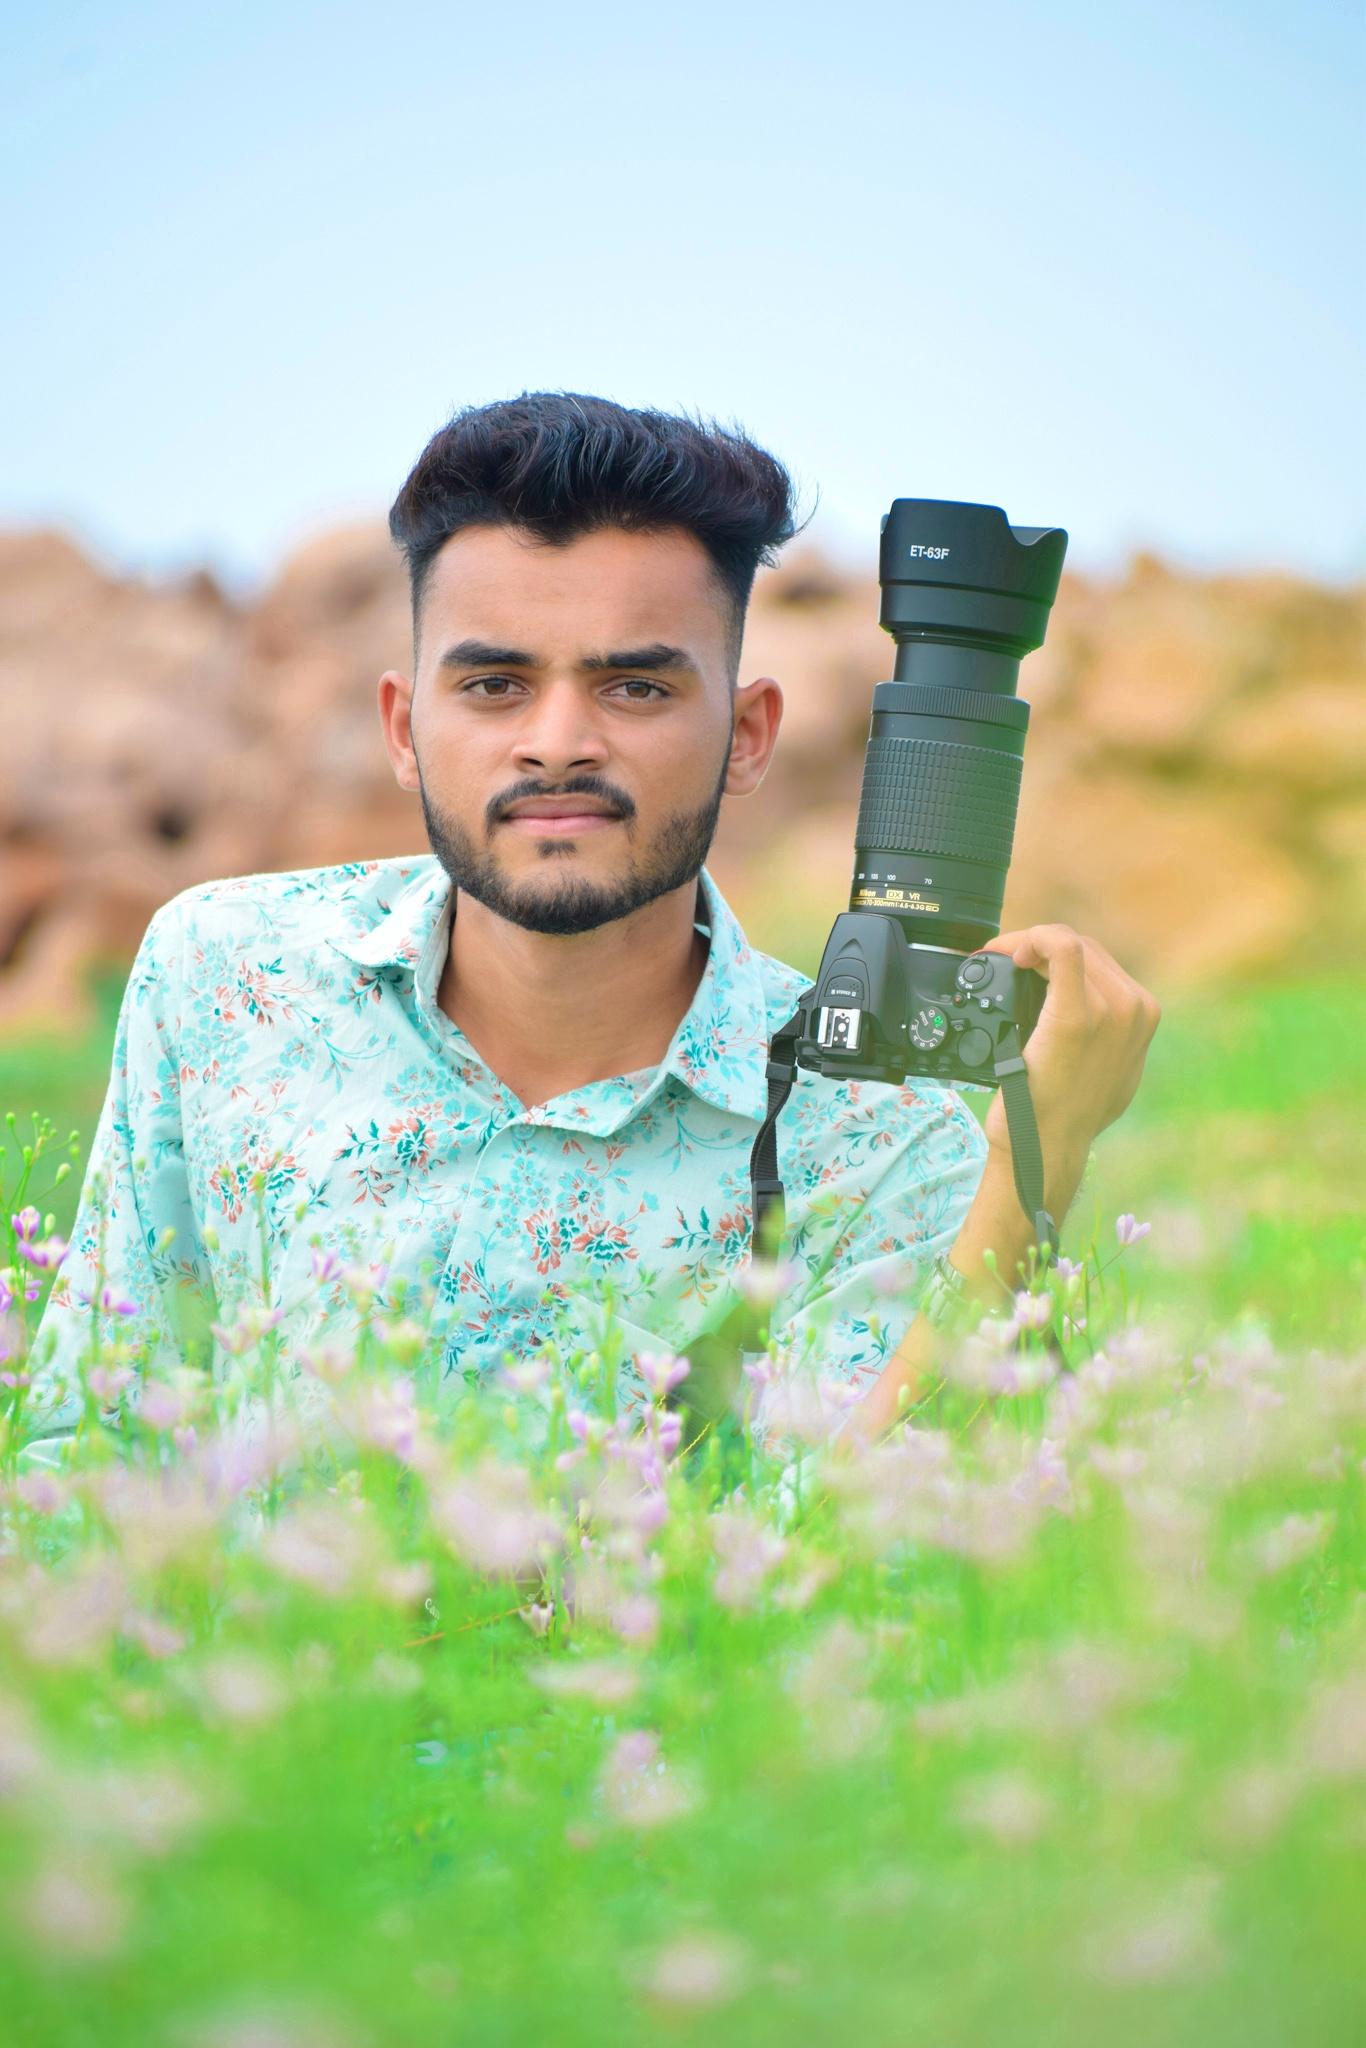 man posing with camera